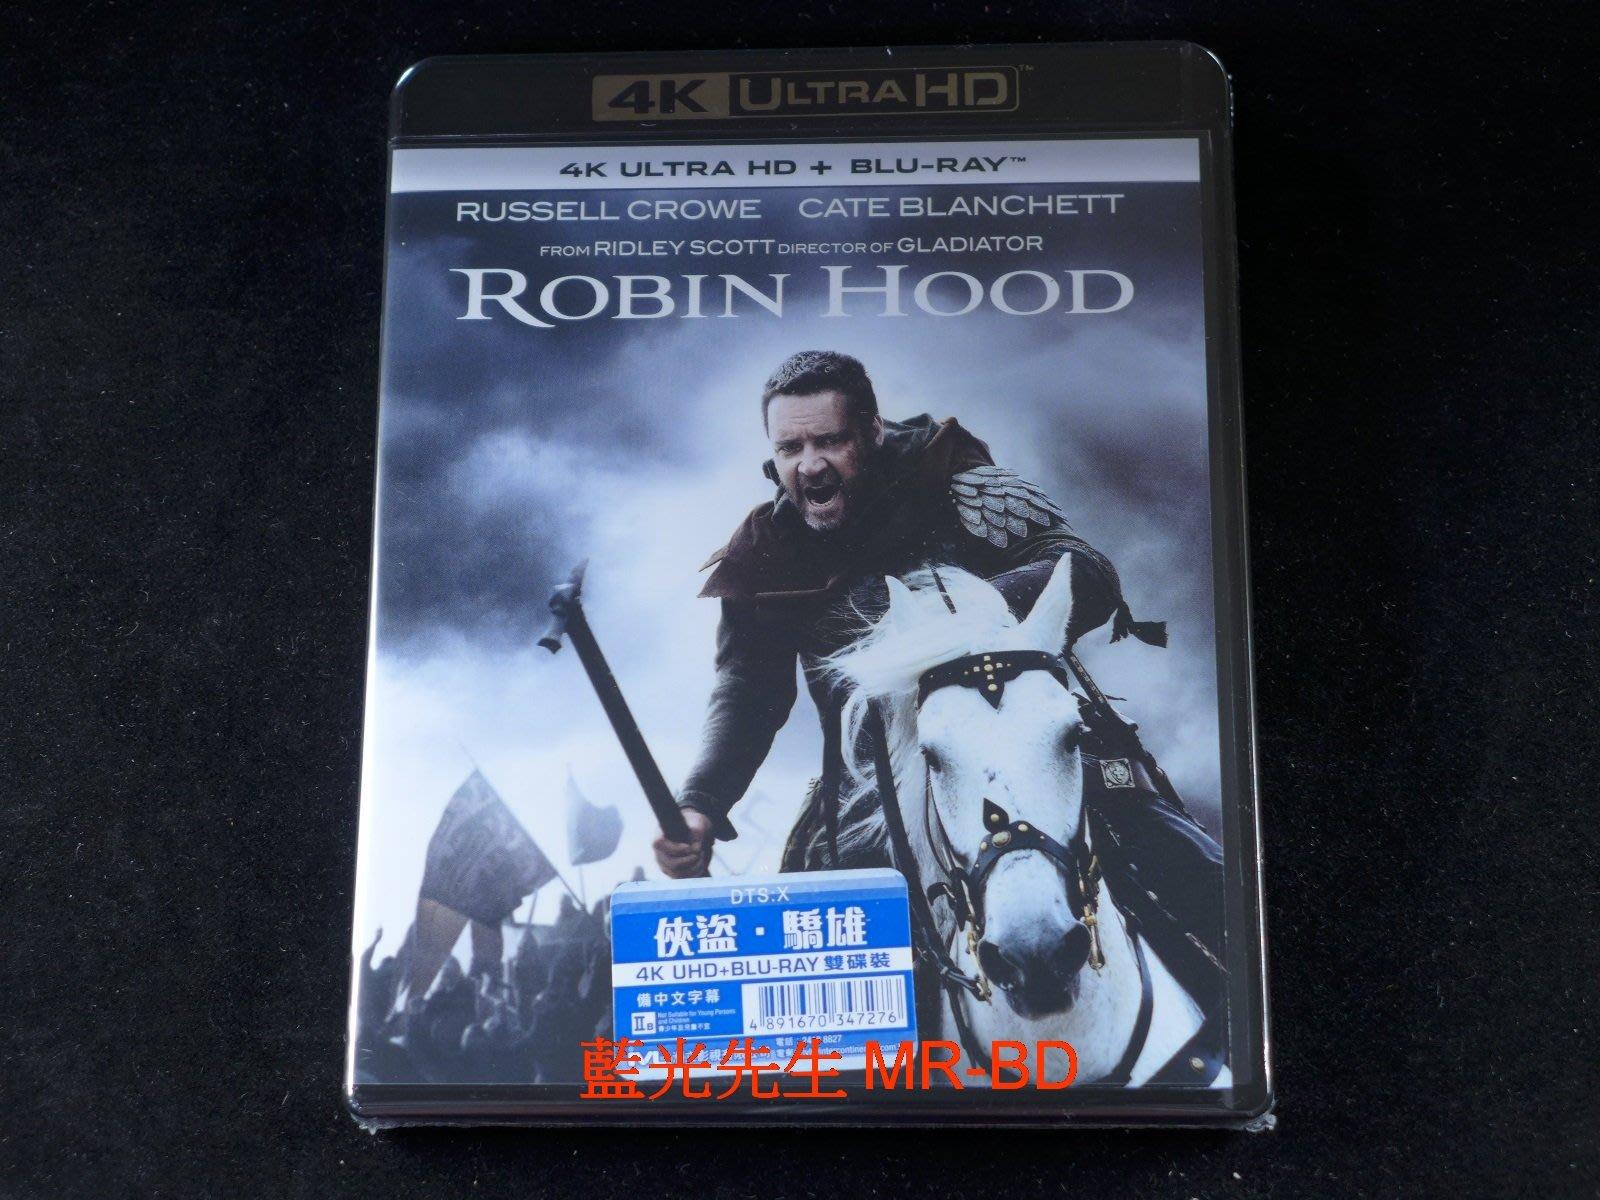 [4K-UHD藍光BD] - 羅賓漢 Robin Hood UHD + BD 雙碟限定版